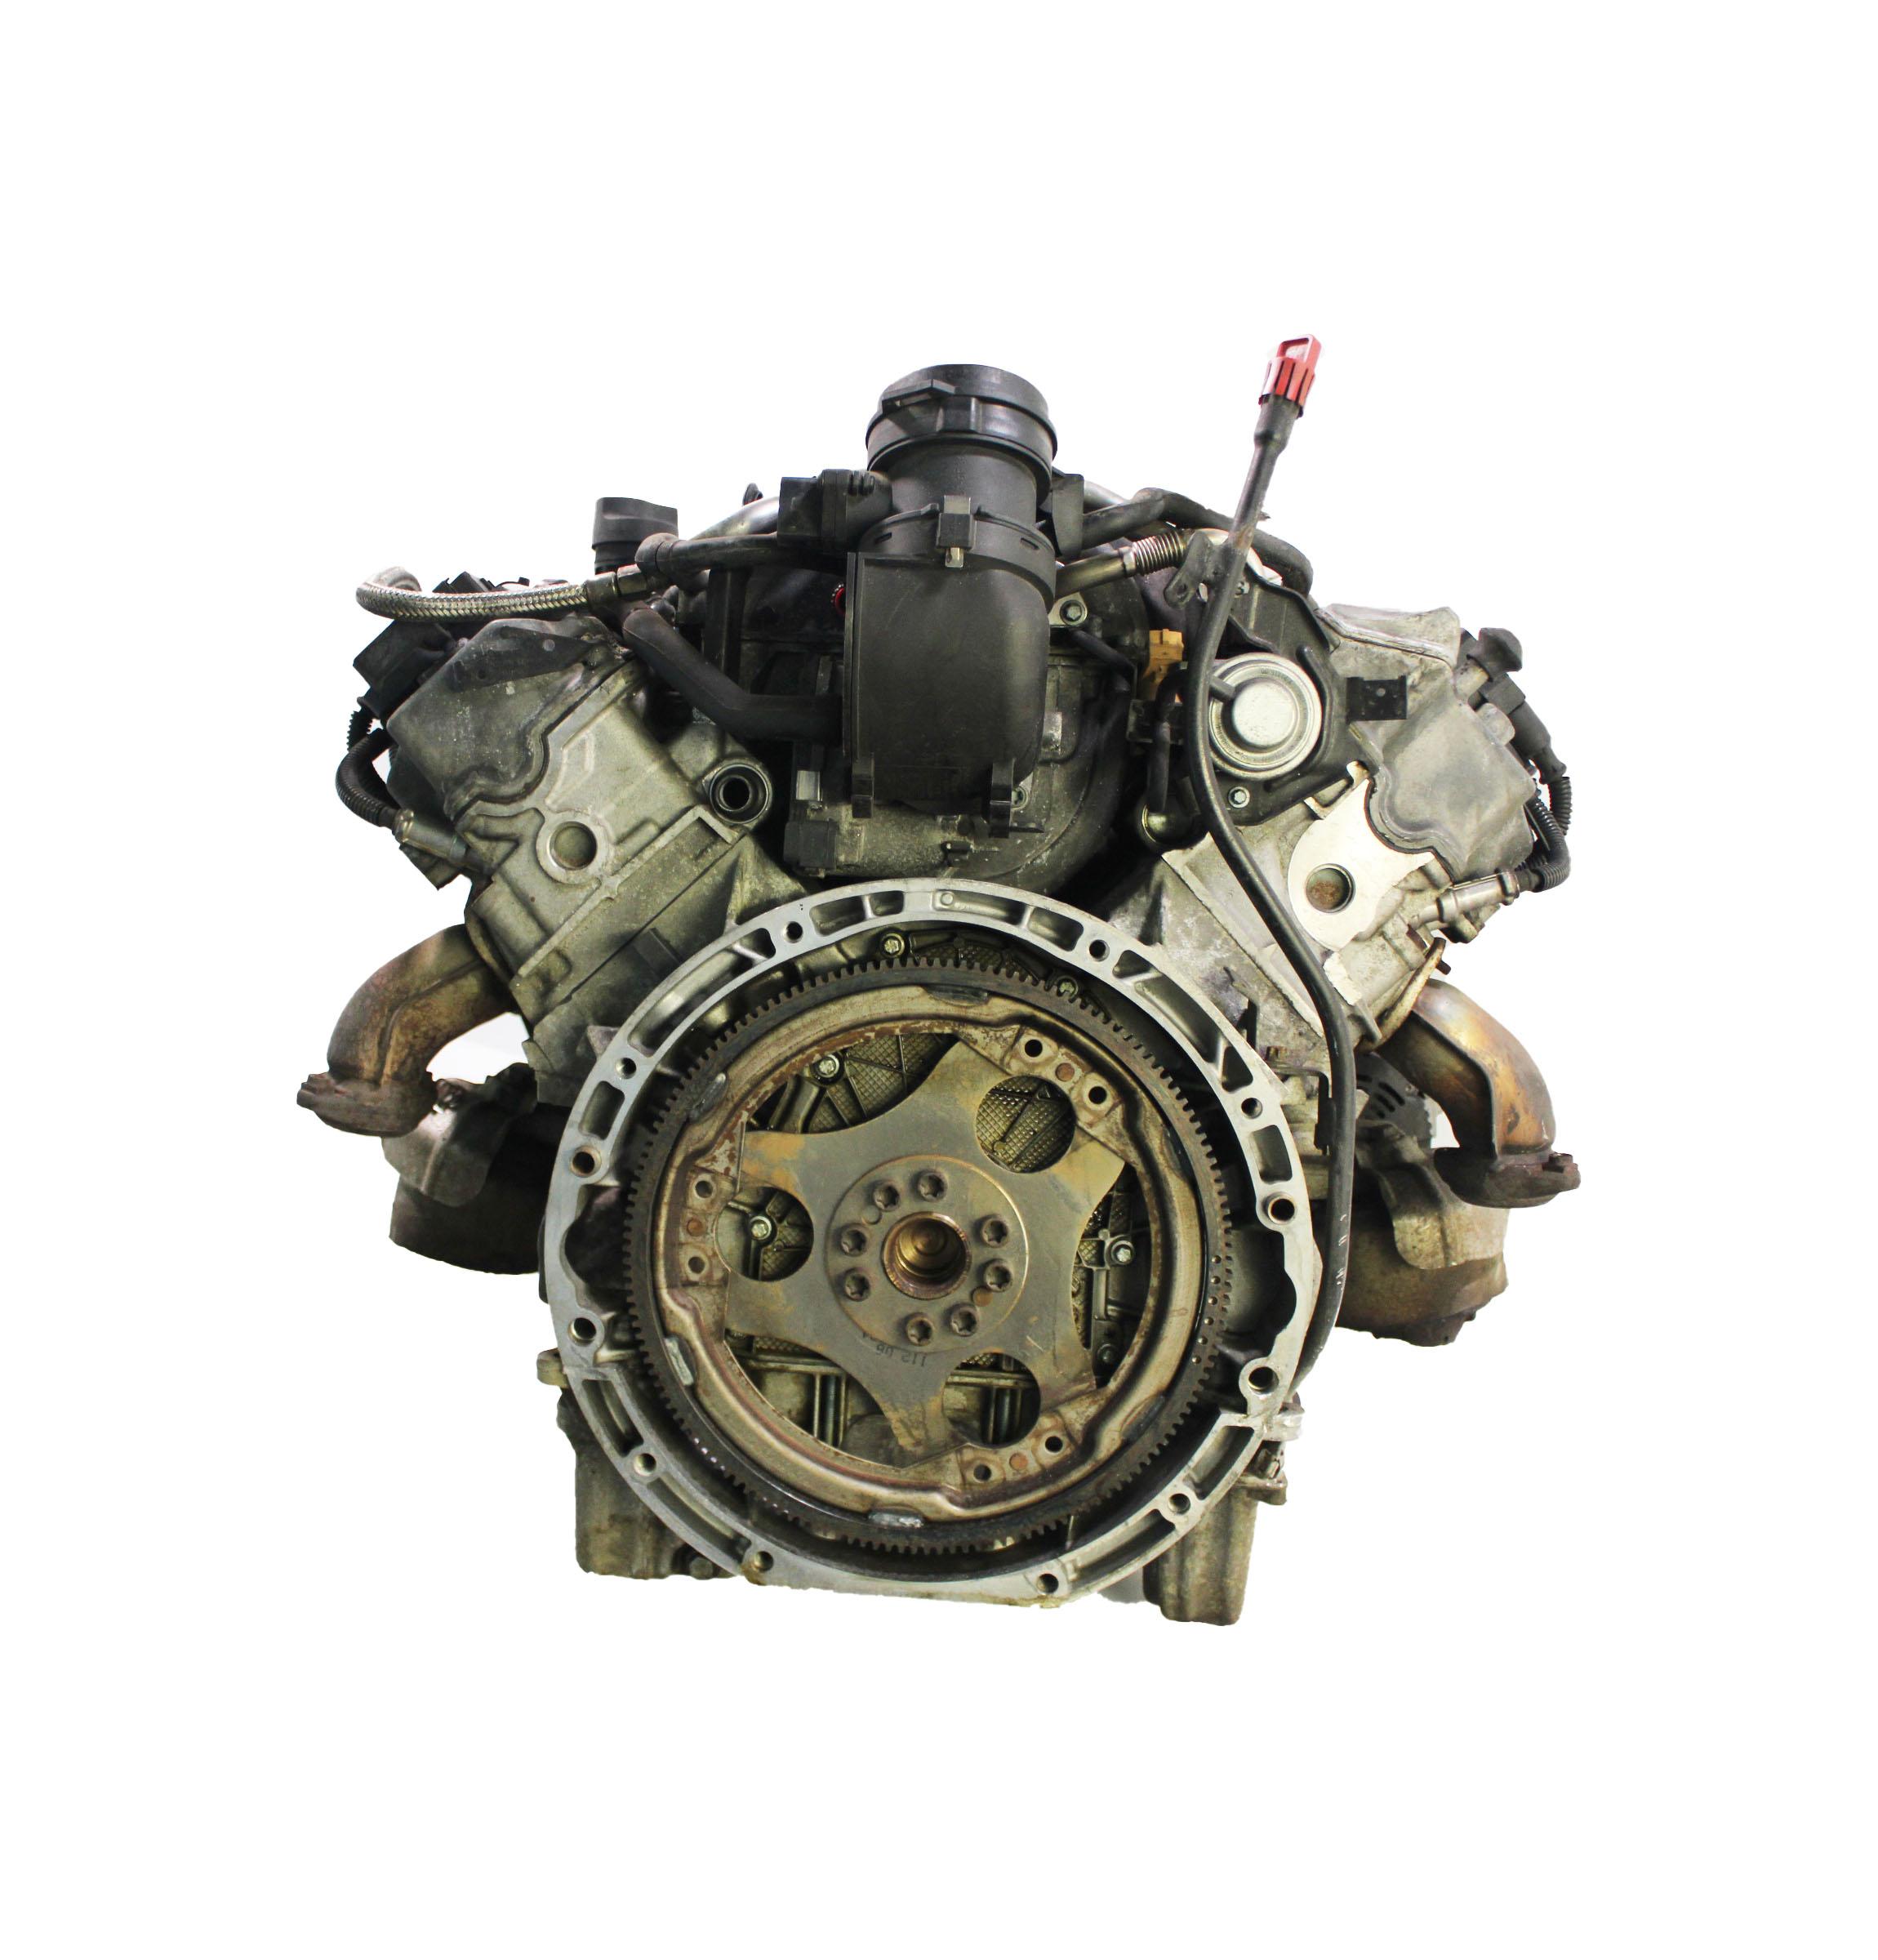 Motor für Mercedes Benz CLK C209 A209 320 3,2 Benzin 112.955 M112.955 218 PS